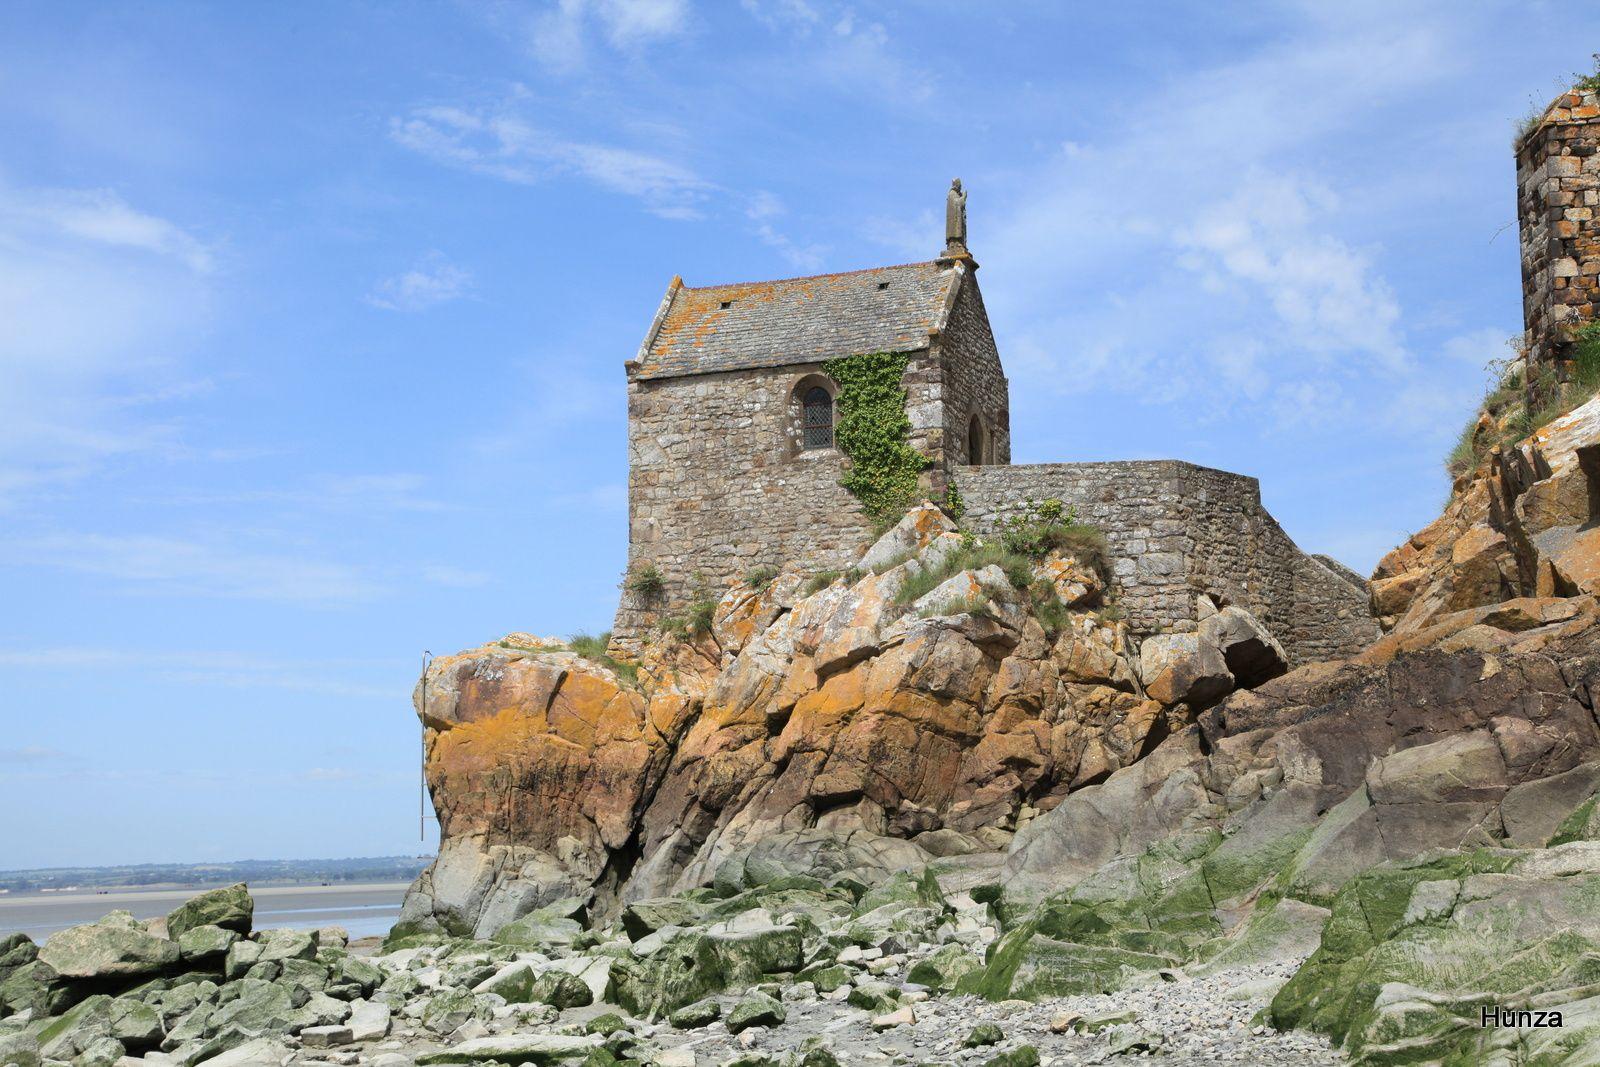 La chapelle Saint-Aubert